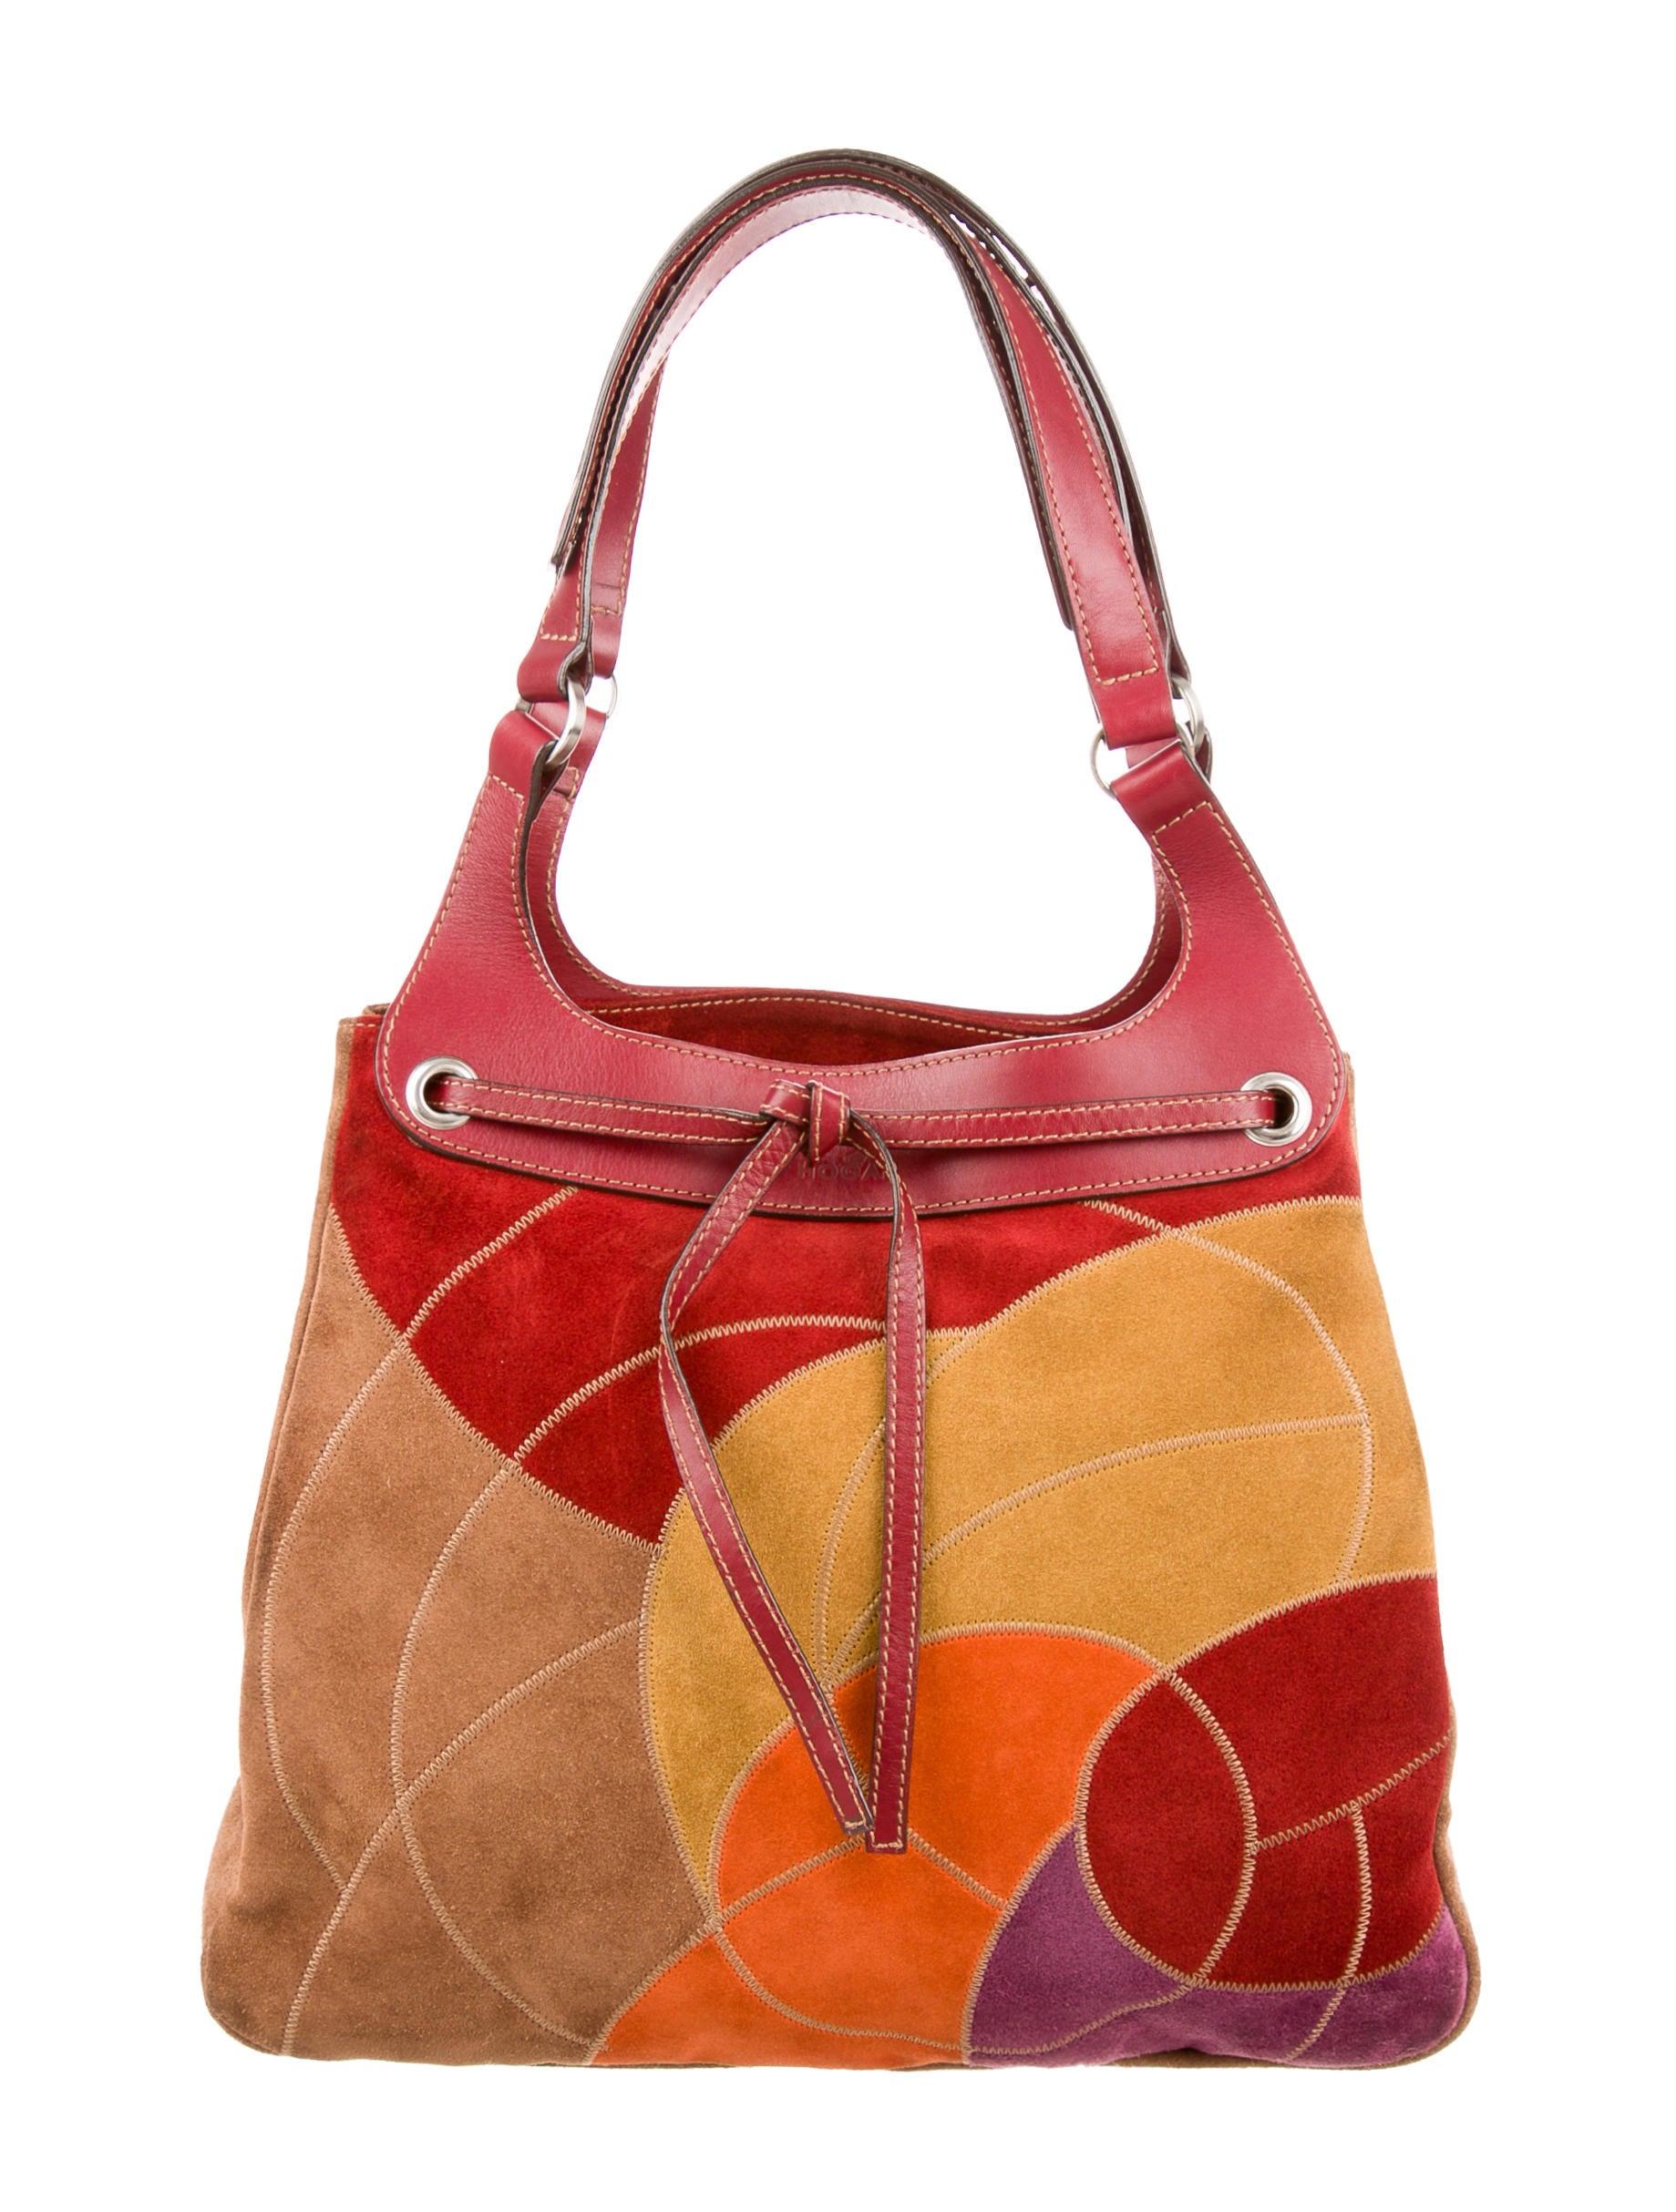 c038373077a Hogan Suede Patchwork Bag - Handbags - WHO20294   The RealReal